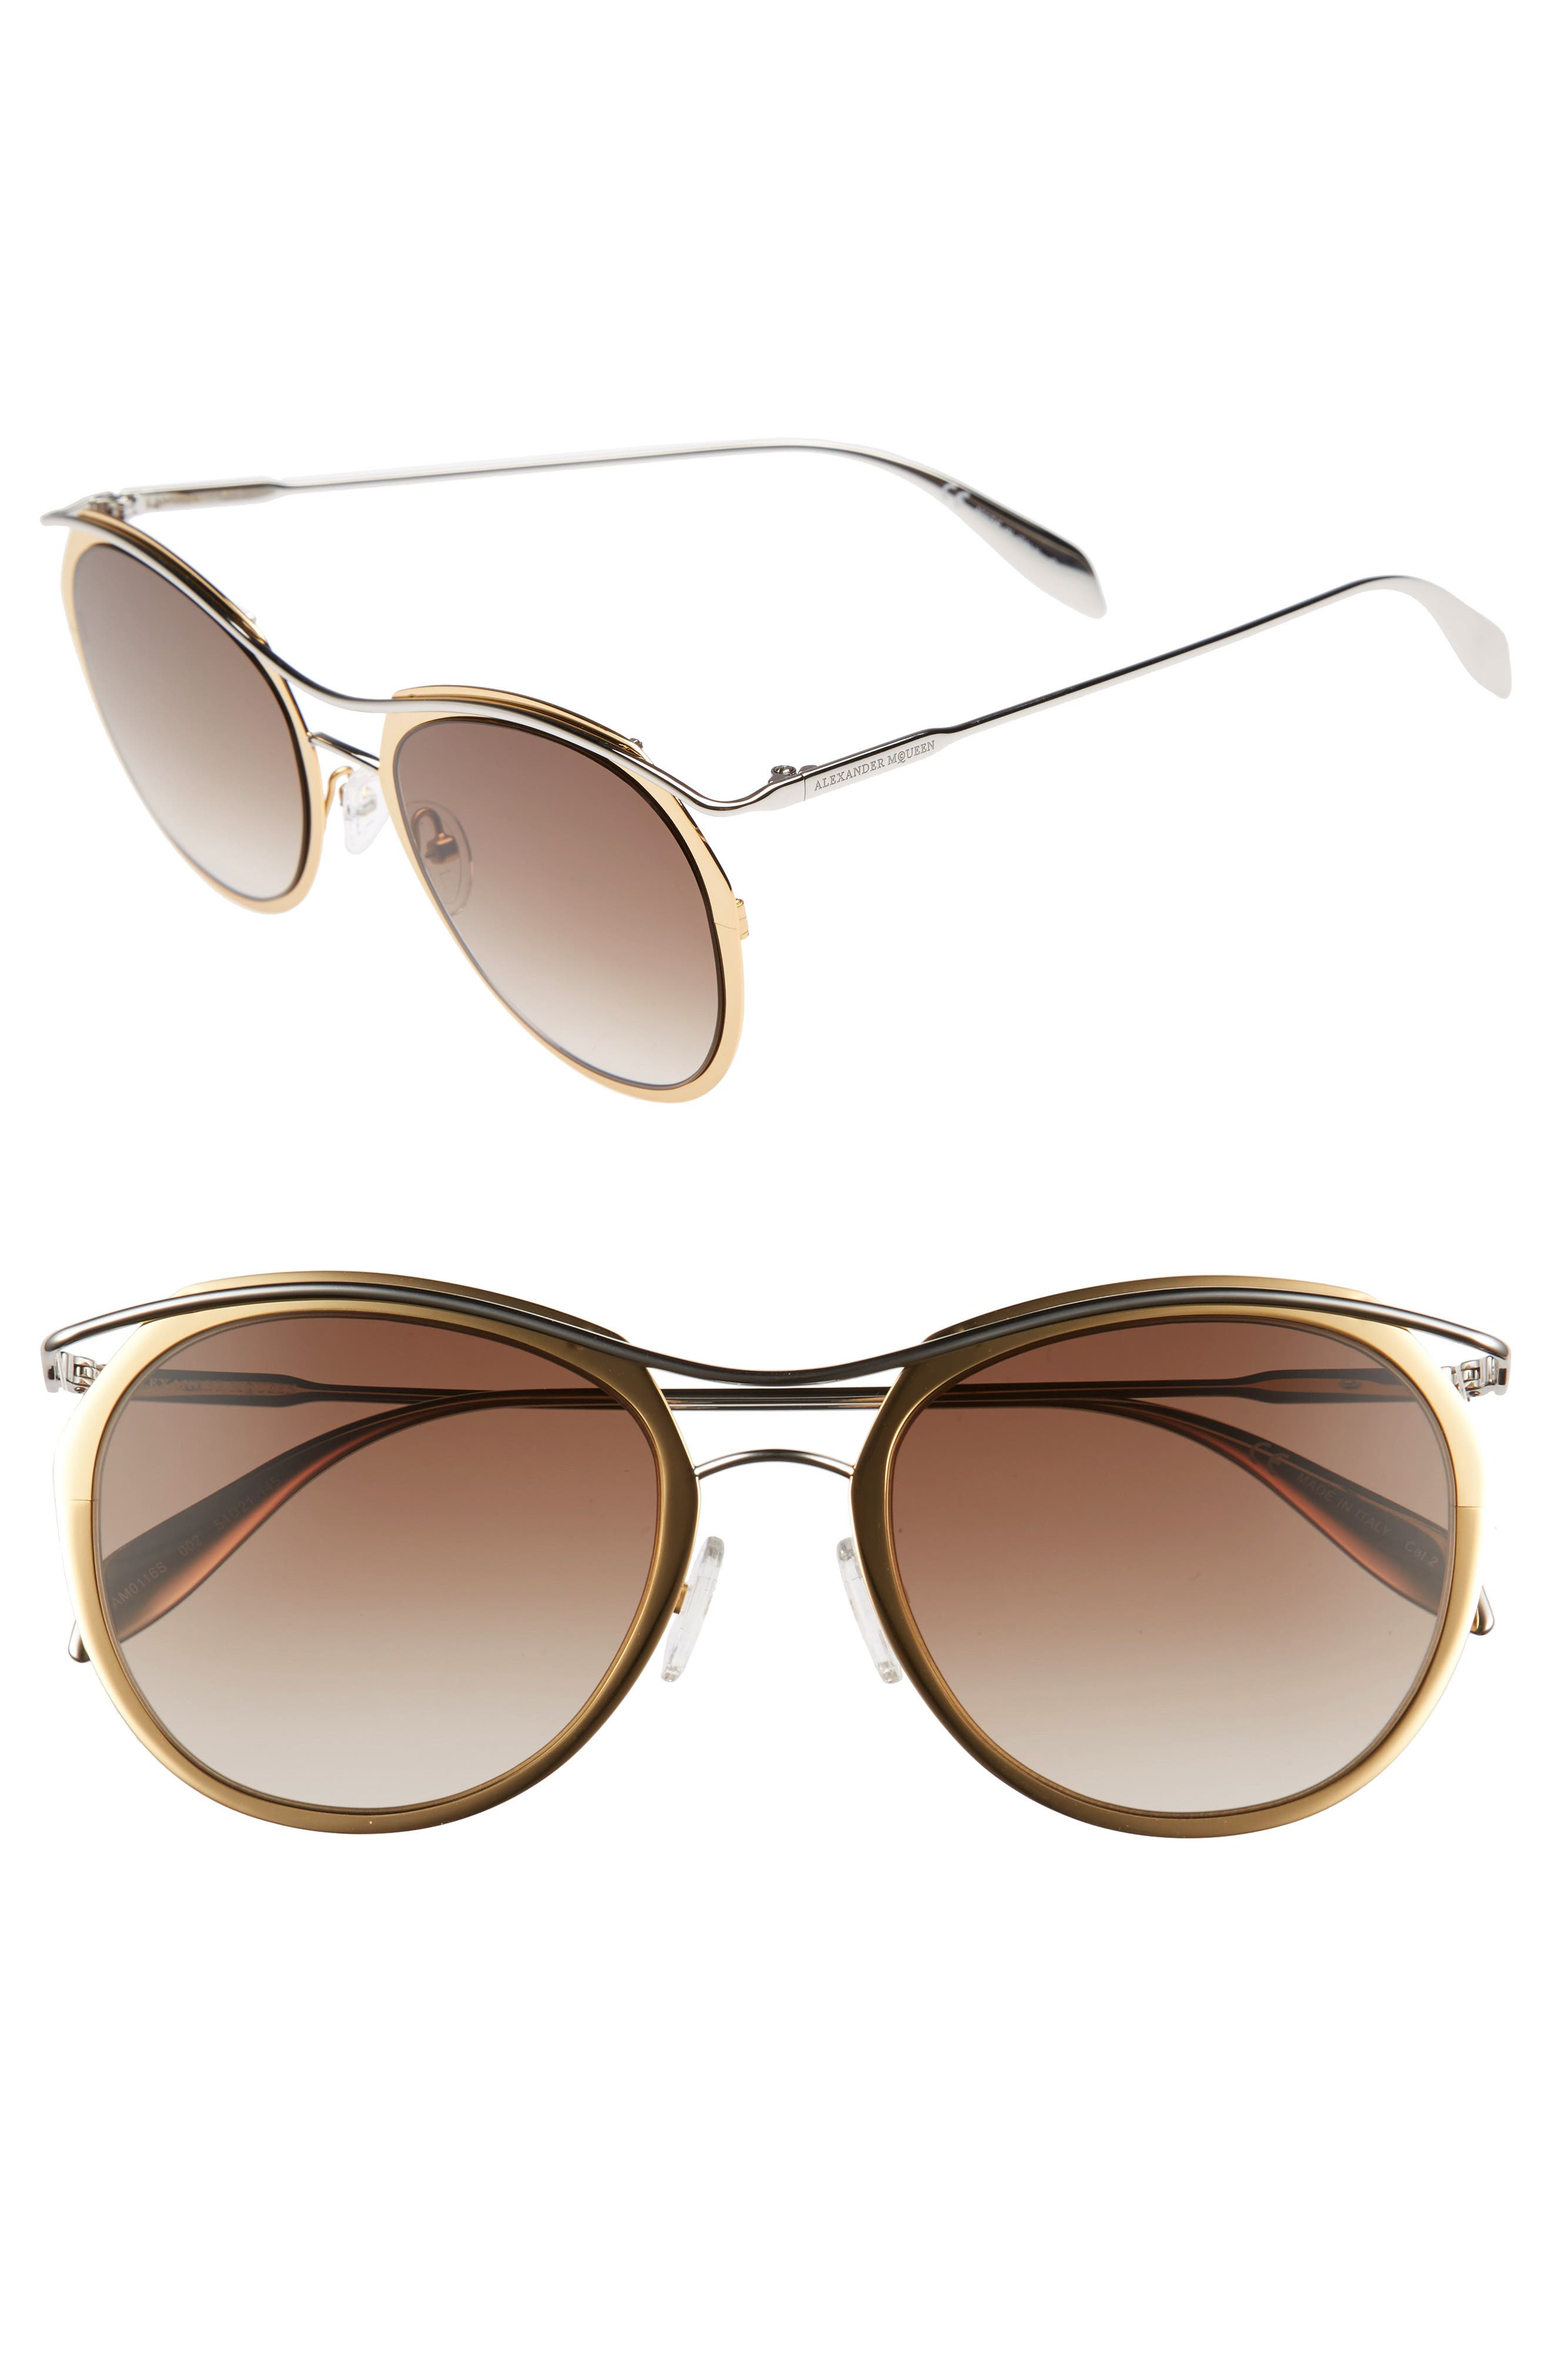 Alternate Image 1 Selected - Alexander McQueen 54mm Gradient Round Sunglasses